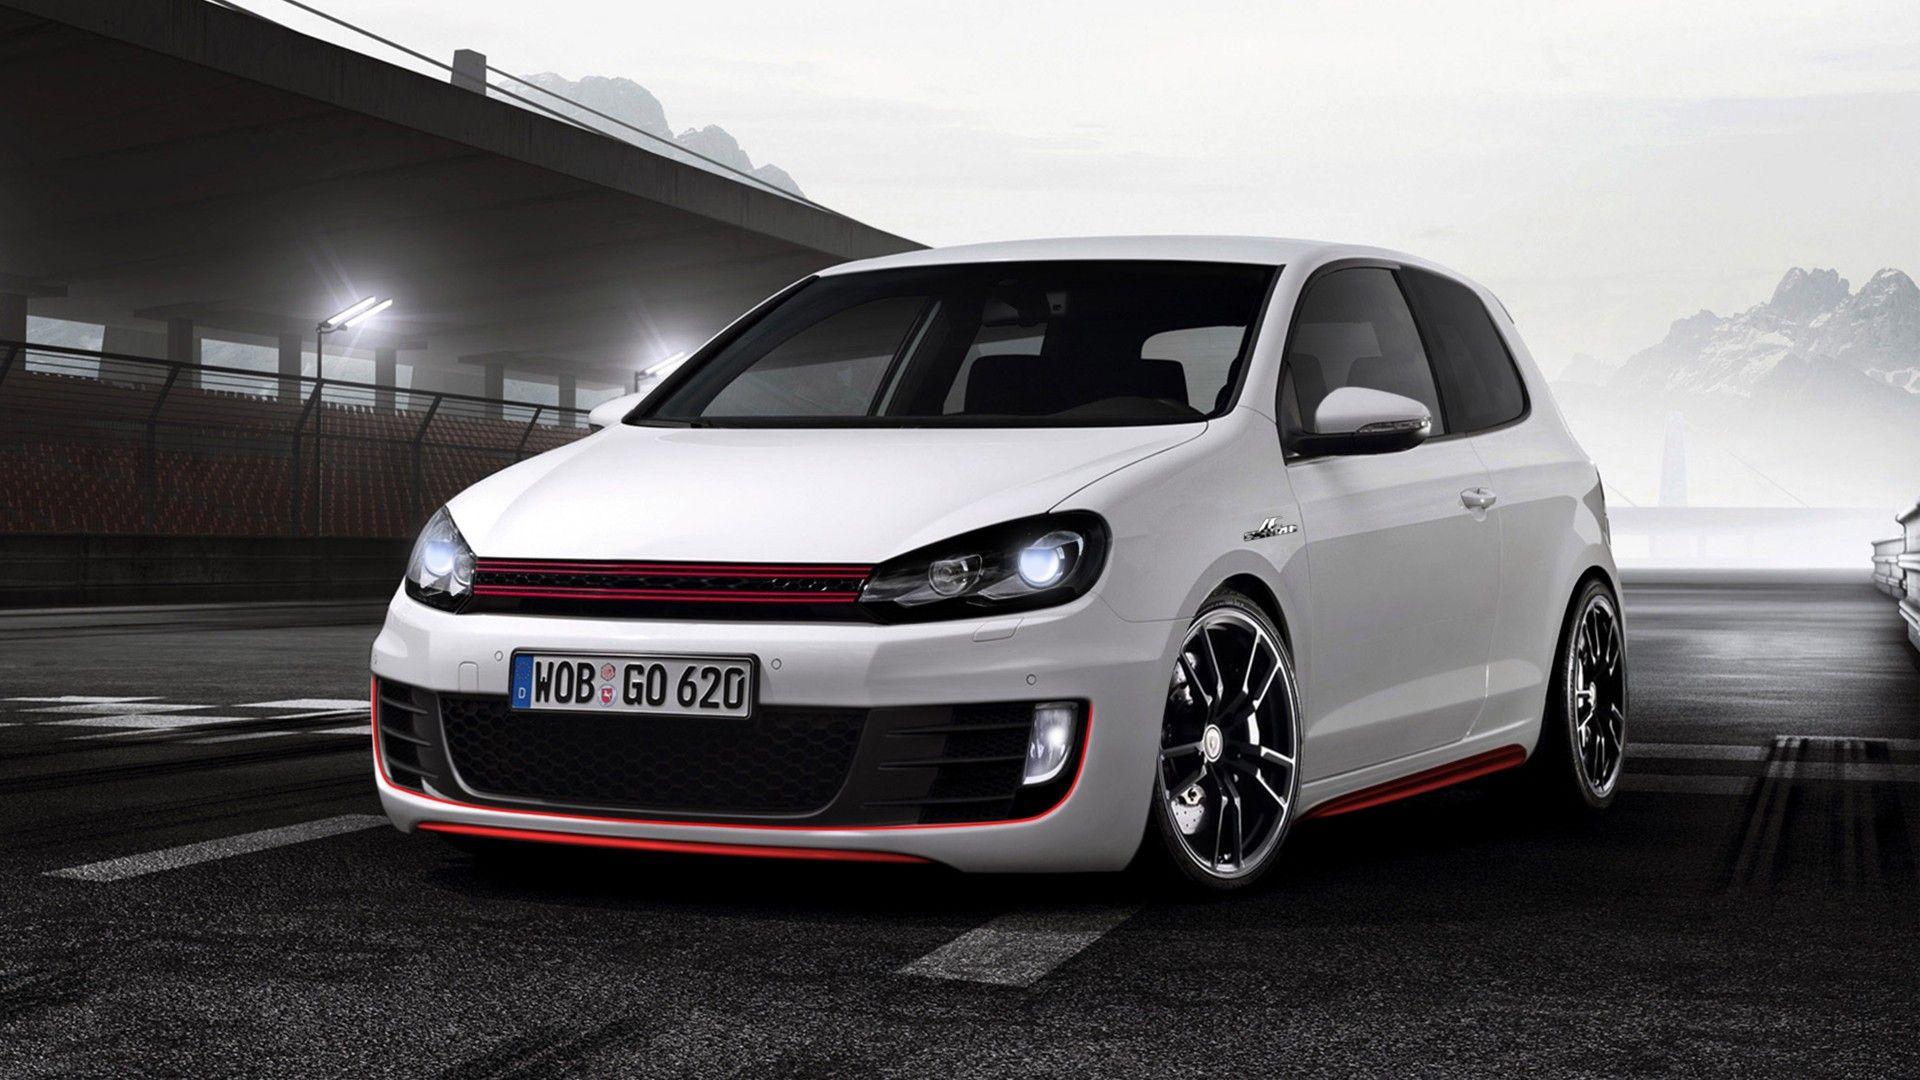 Luxurious Vw Sport Full Hd Car Wallpapers: Volkswagen Golf GTI Sport HD Picture Wallpaper